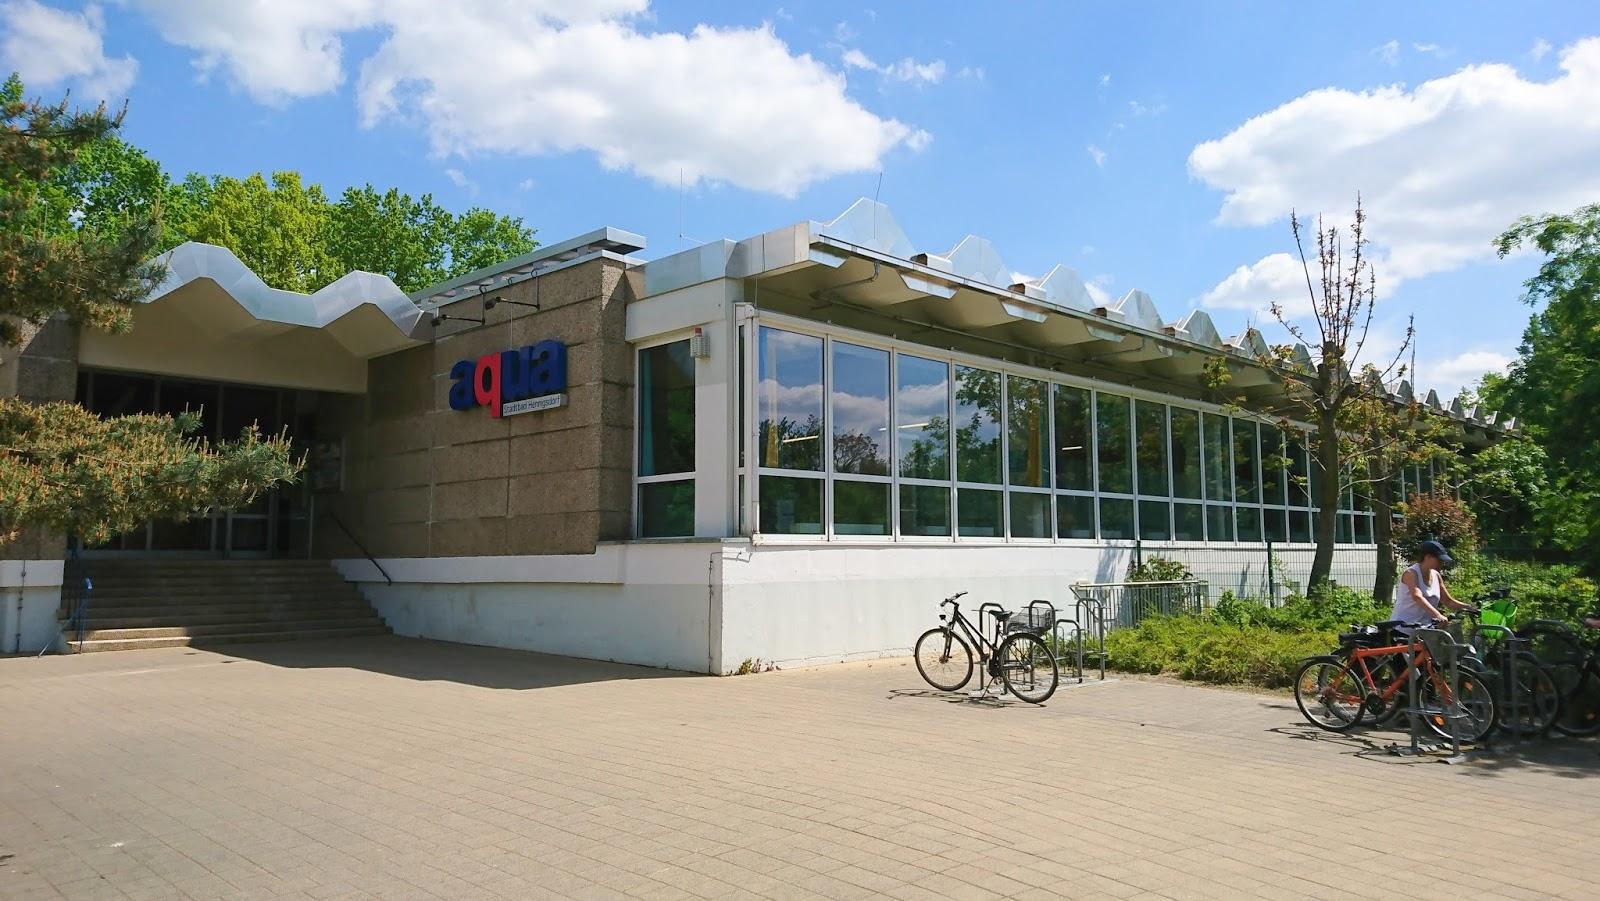 Iberty Schwimmbad Brandenburg Aqua Stadtbad Hennigsdorf